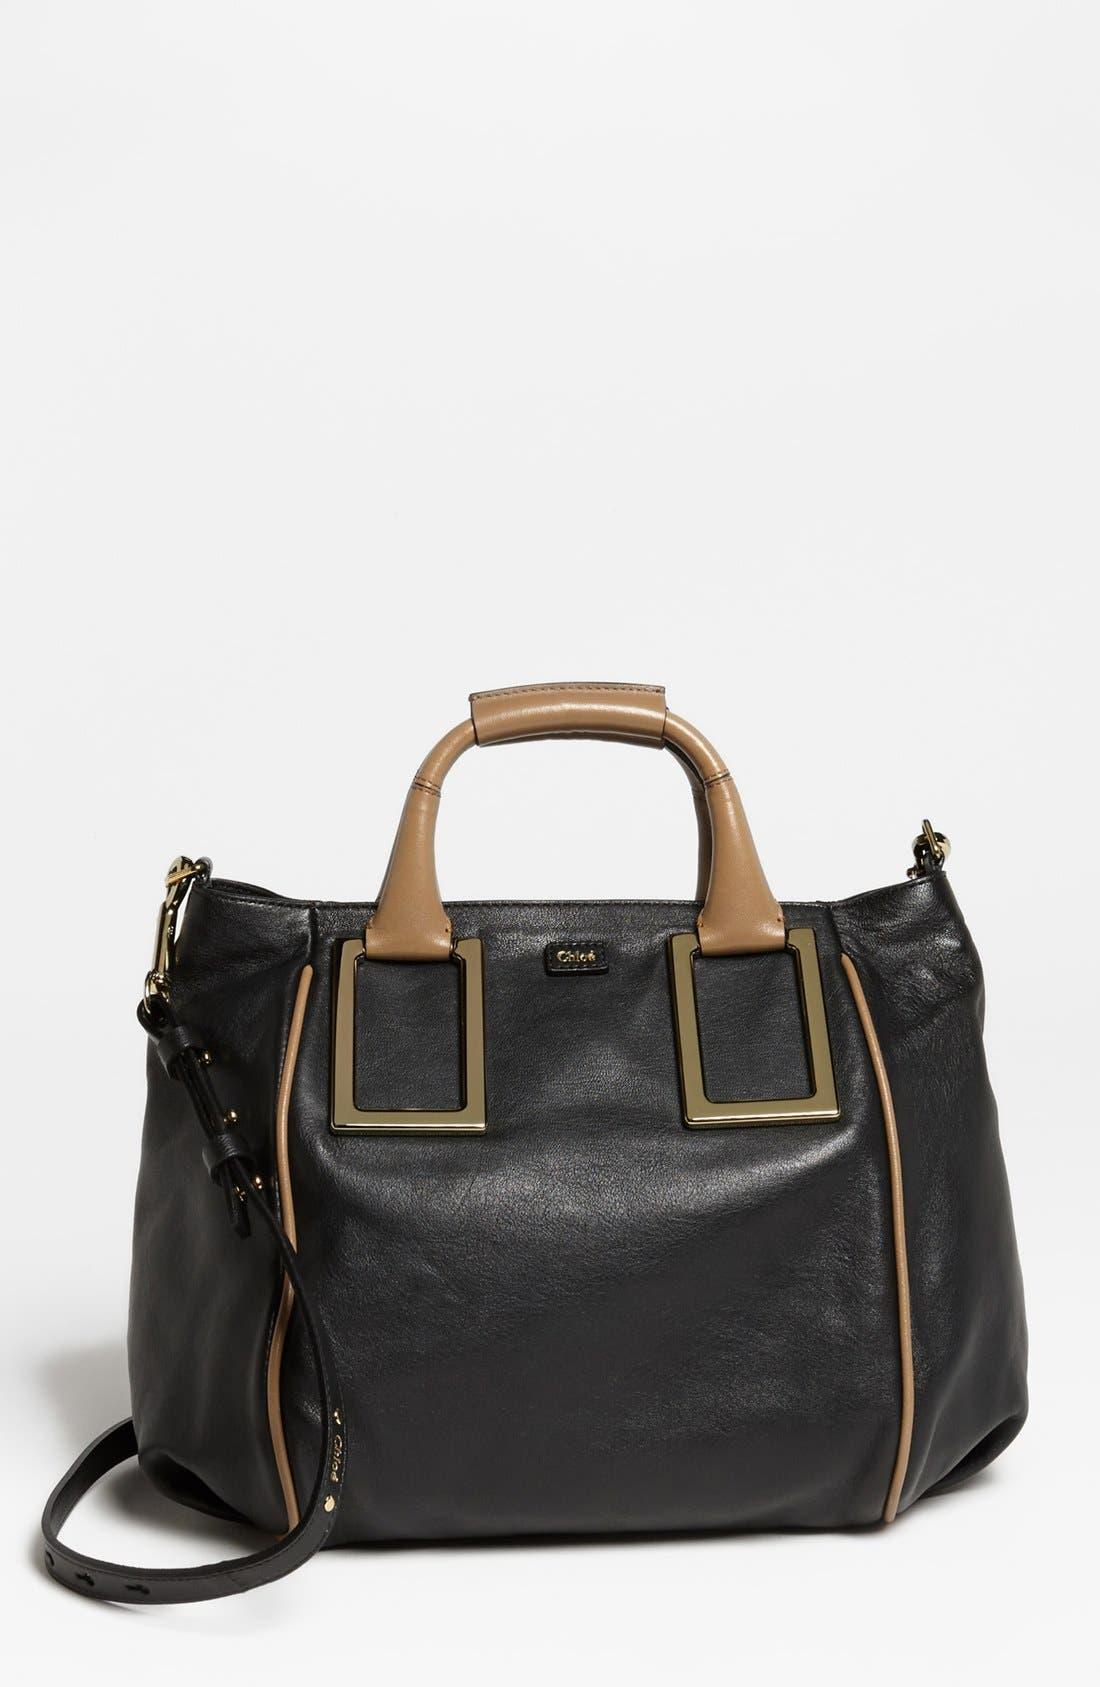 Alternate Image 1 Selected - Chloé 'Ethel - Medium' Leather Tote